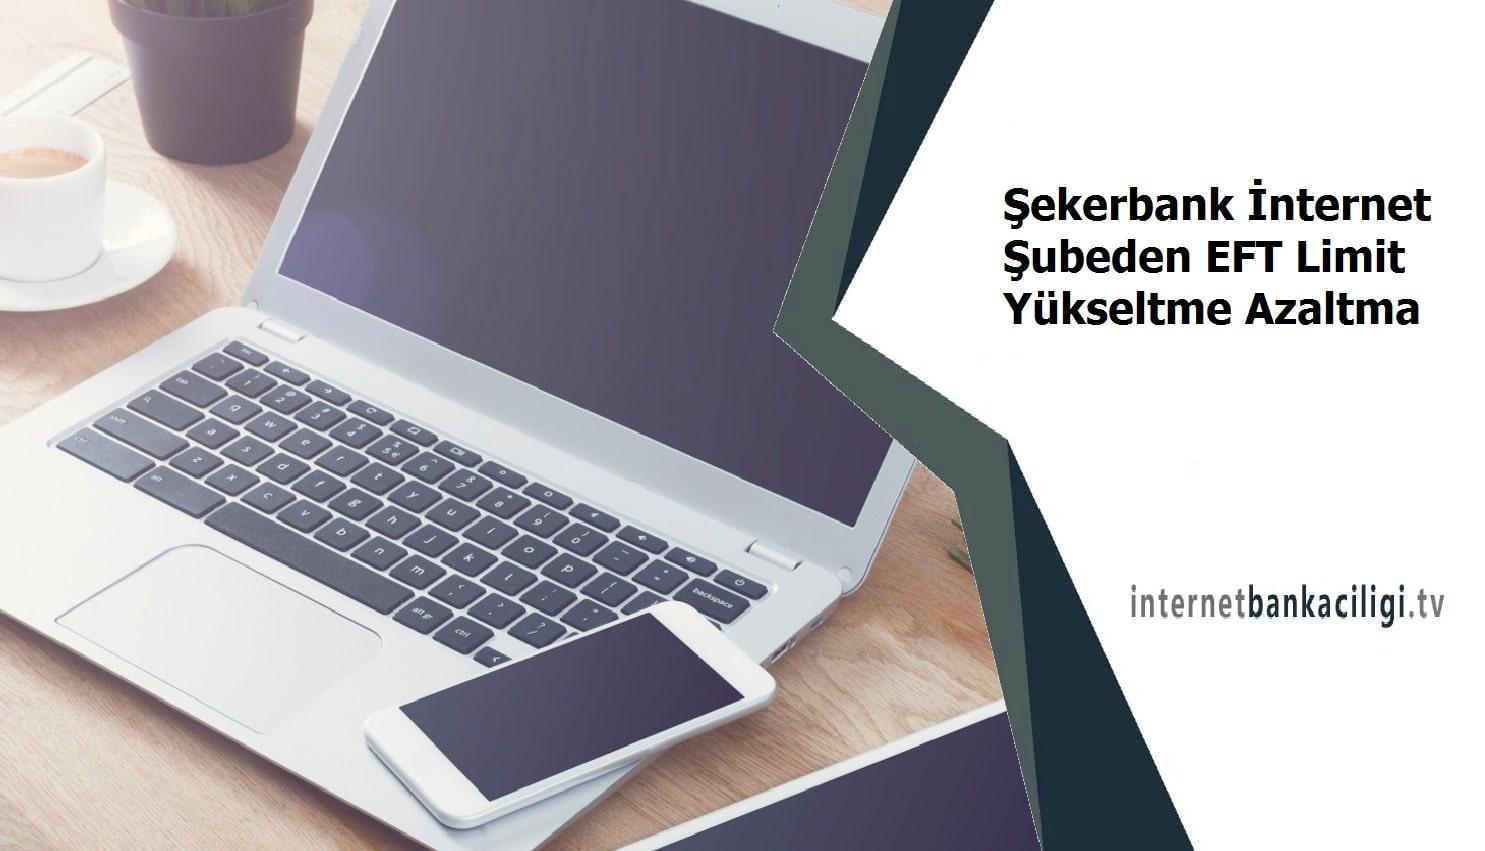 Photo of Şekerbank İnternet Şubeden EFT Limit Yükseltme Azaltma